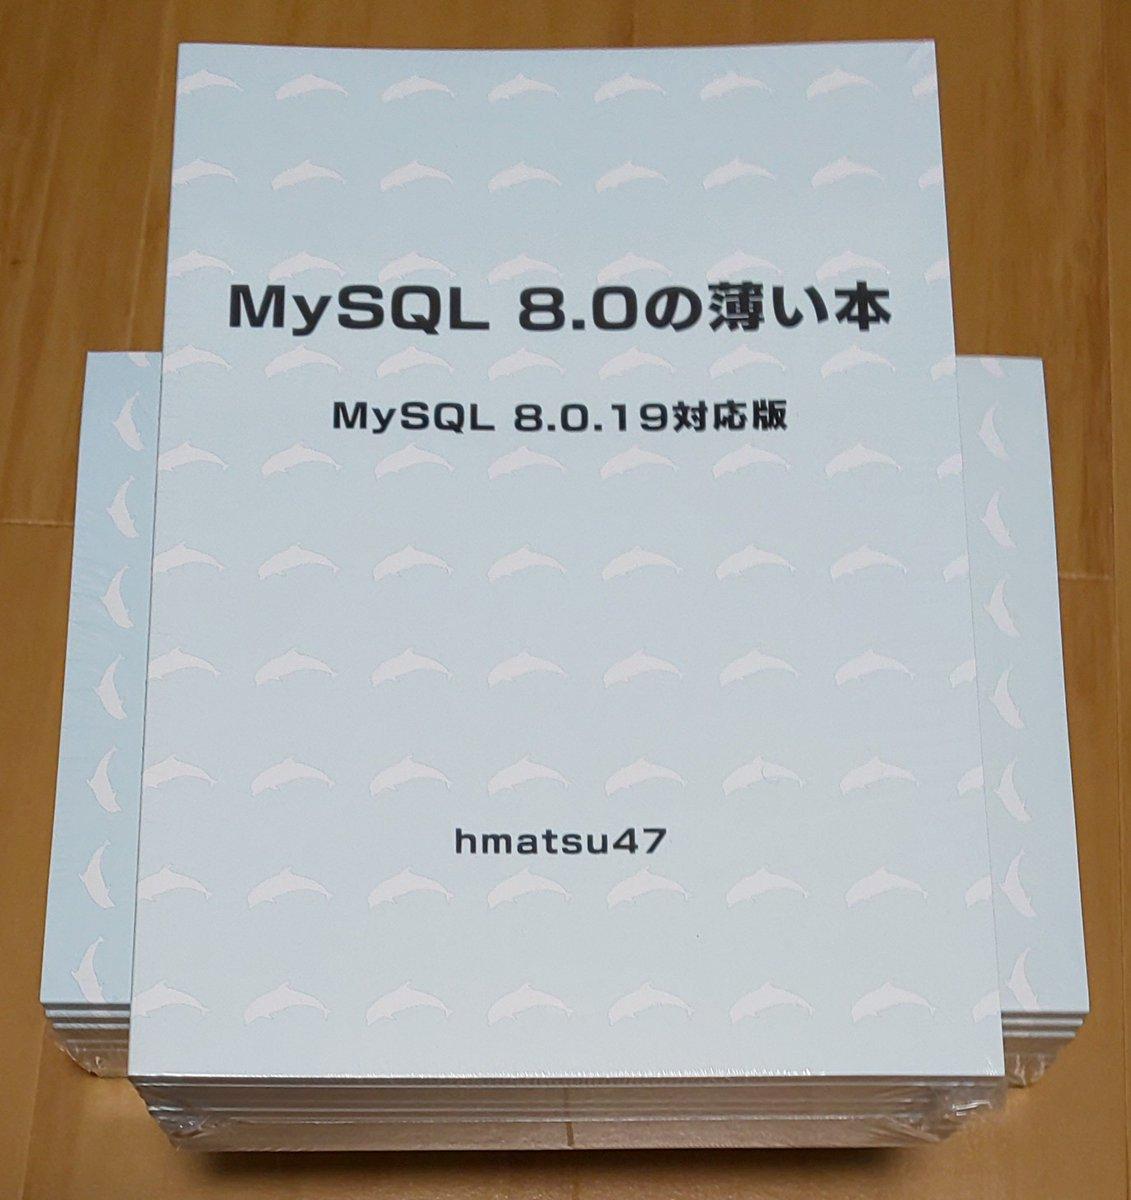 MySQL 8.0の薄い本8.0.19対応版が20冊到着。1/28のMySQL Casual Talks vol.13に持っていきます。